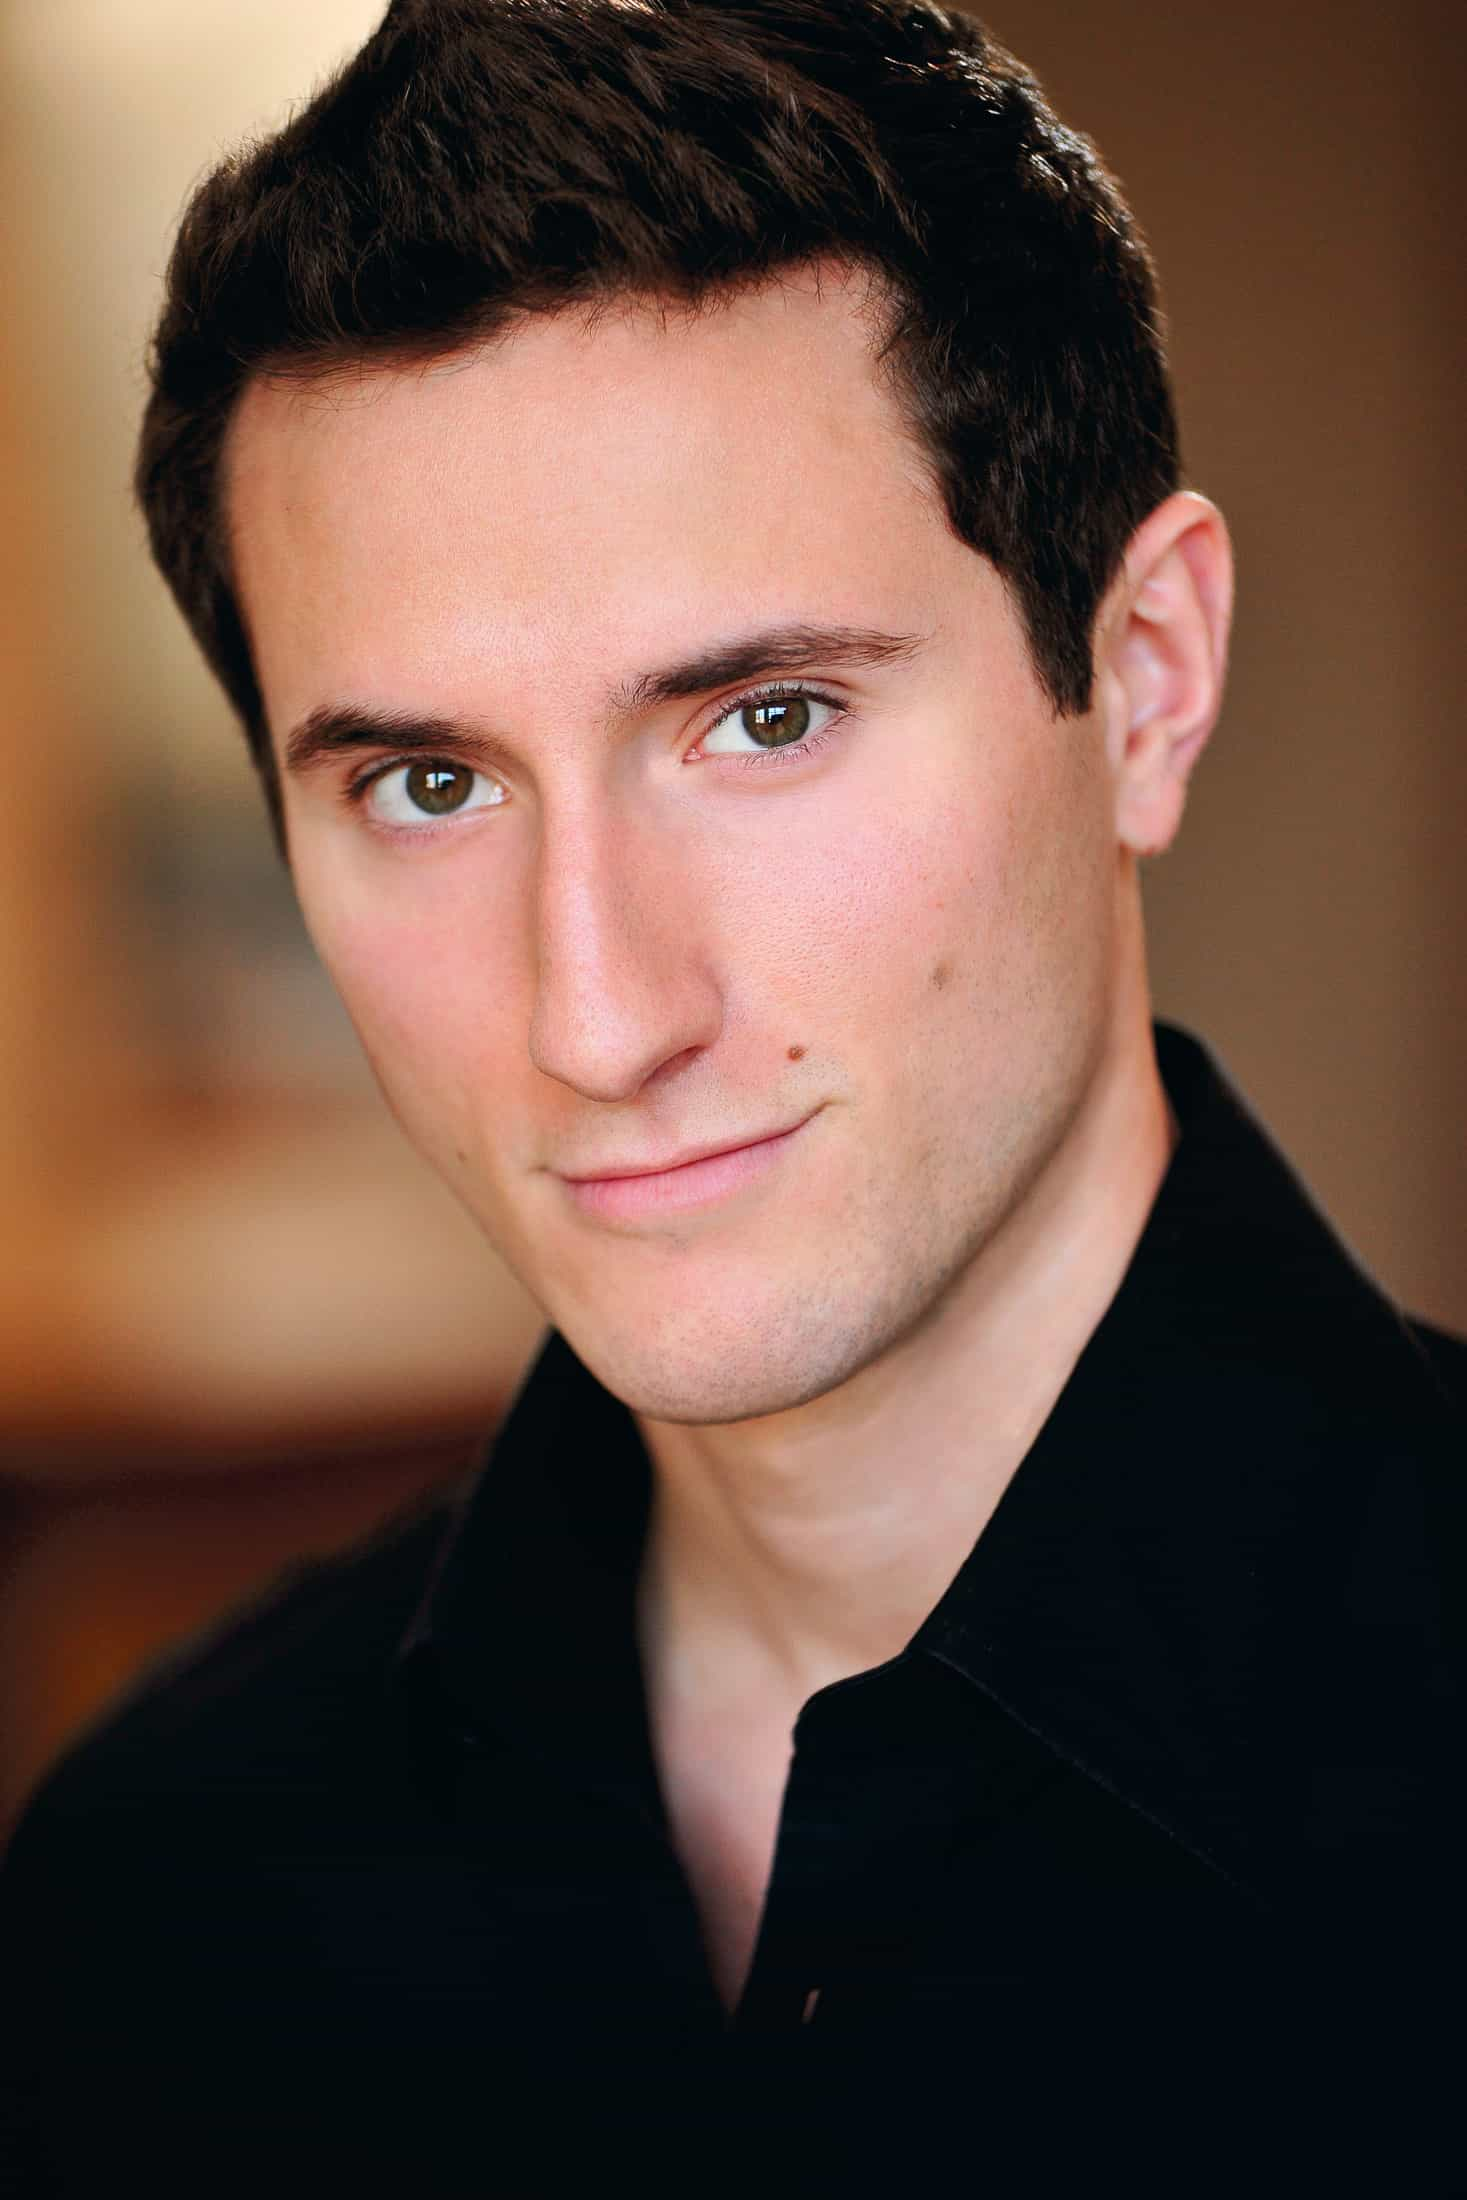 Headshots NYC - Actor Headshots Noah L